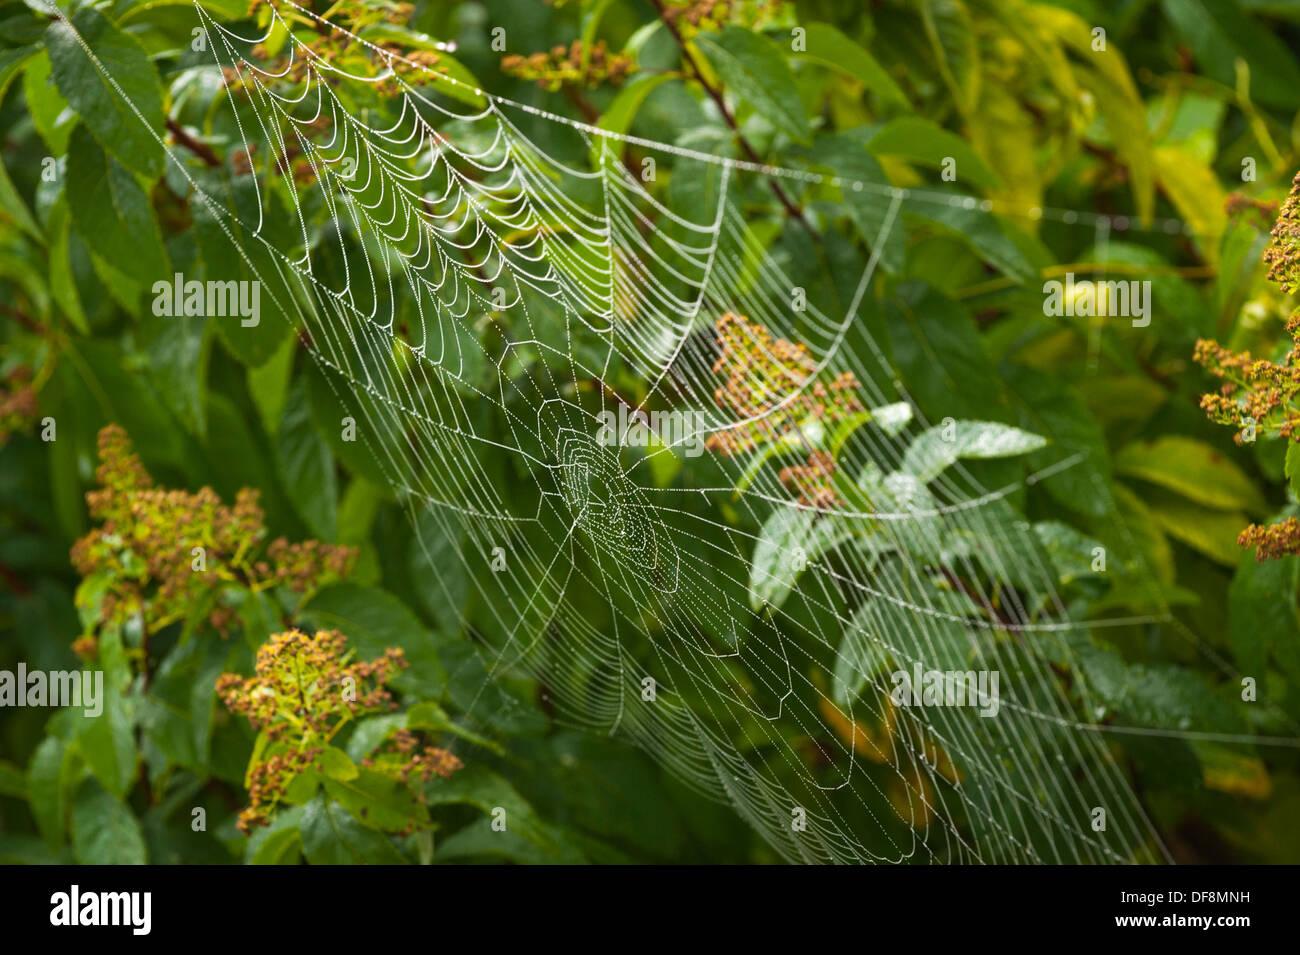 North London suburb European Garden Spider Cross Orb Araneus Diadematus spiders web webs dew rain water drop drops leaf leaves - Stock Image